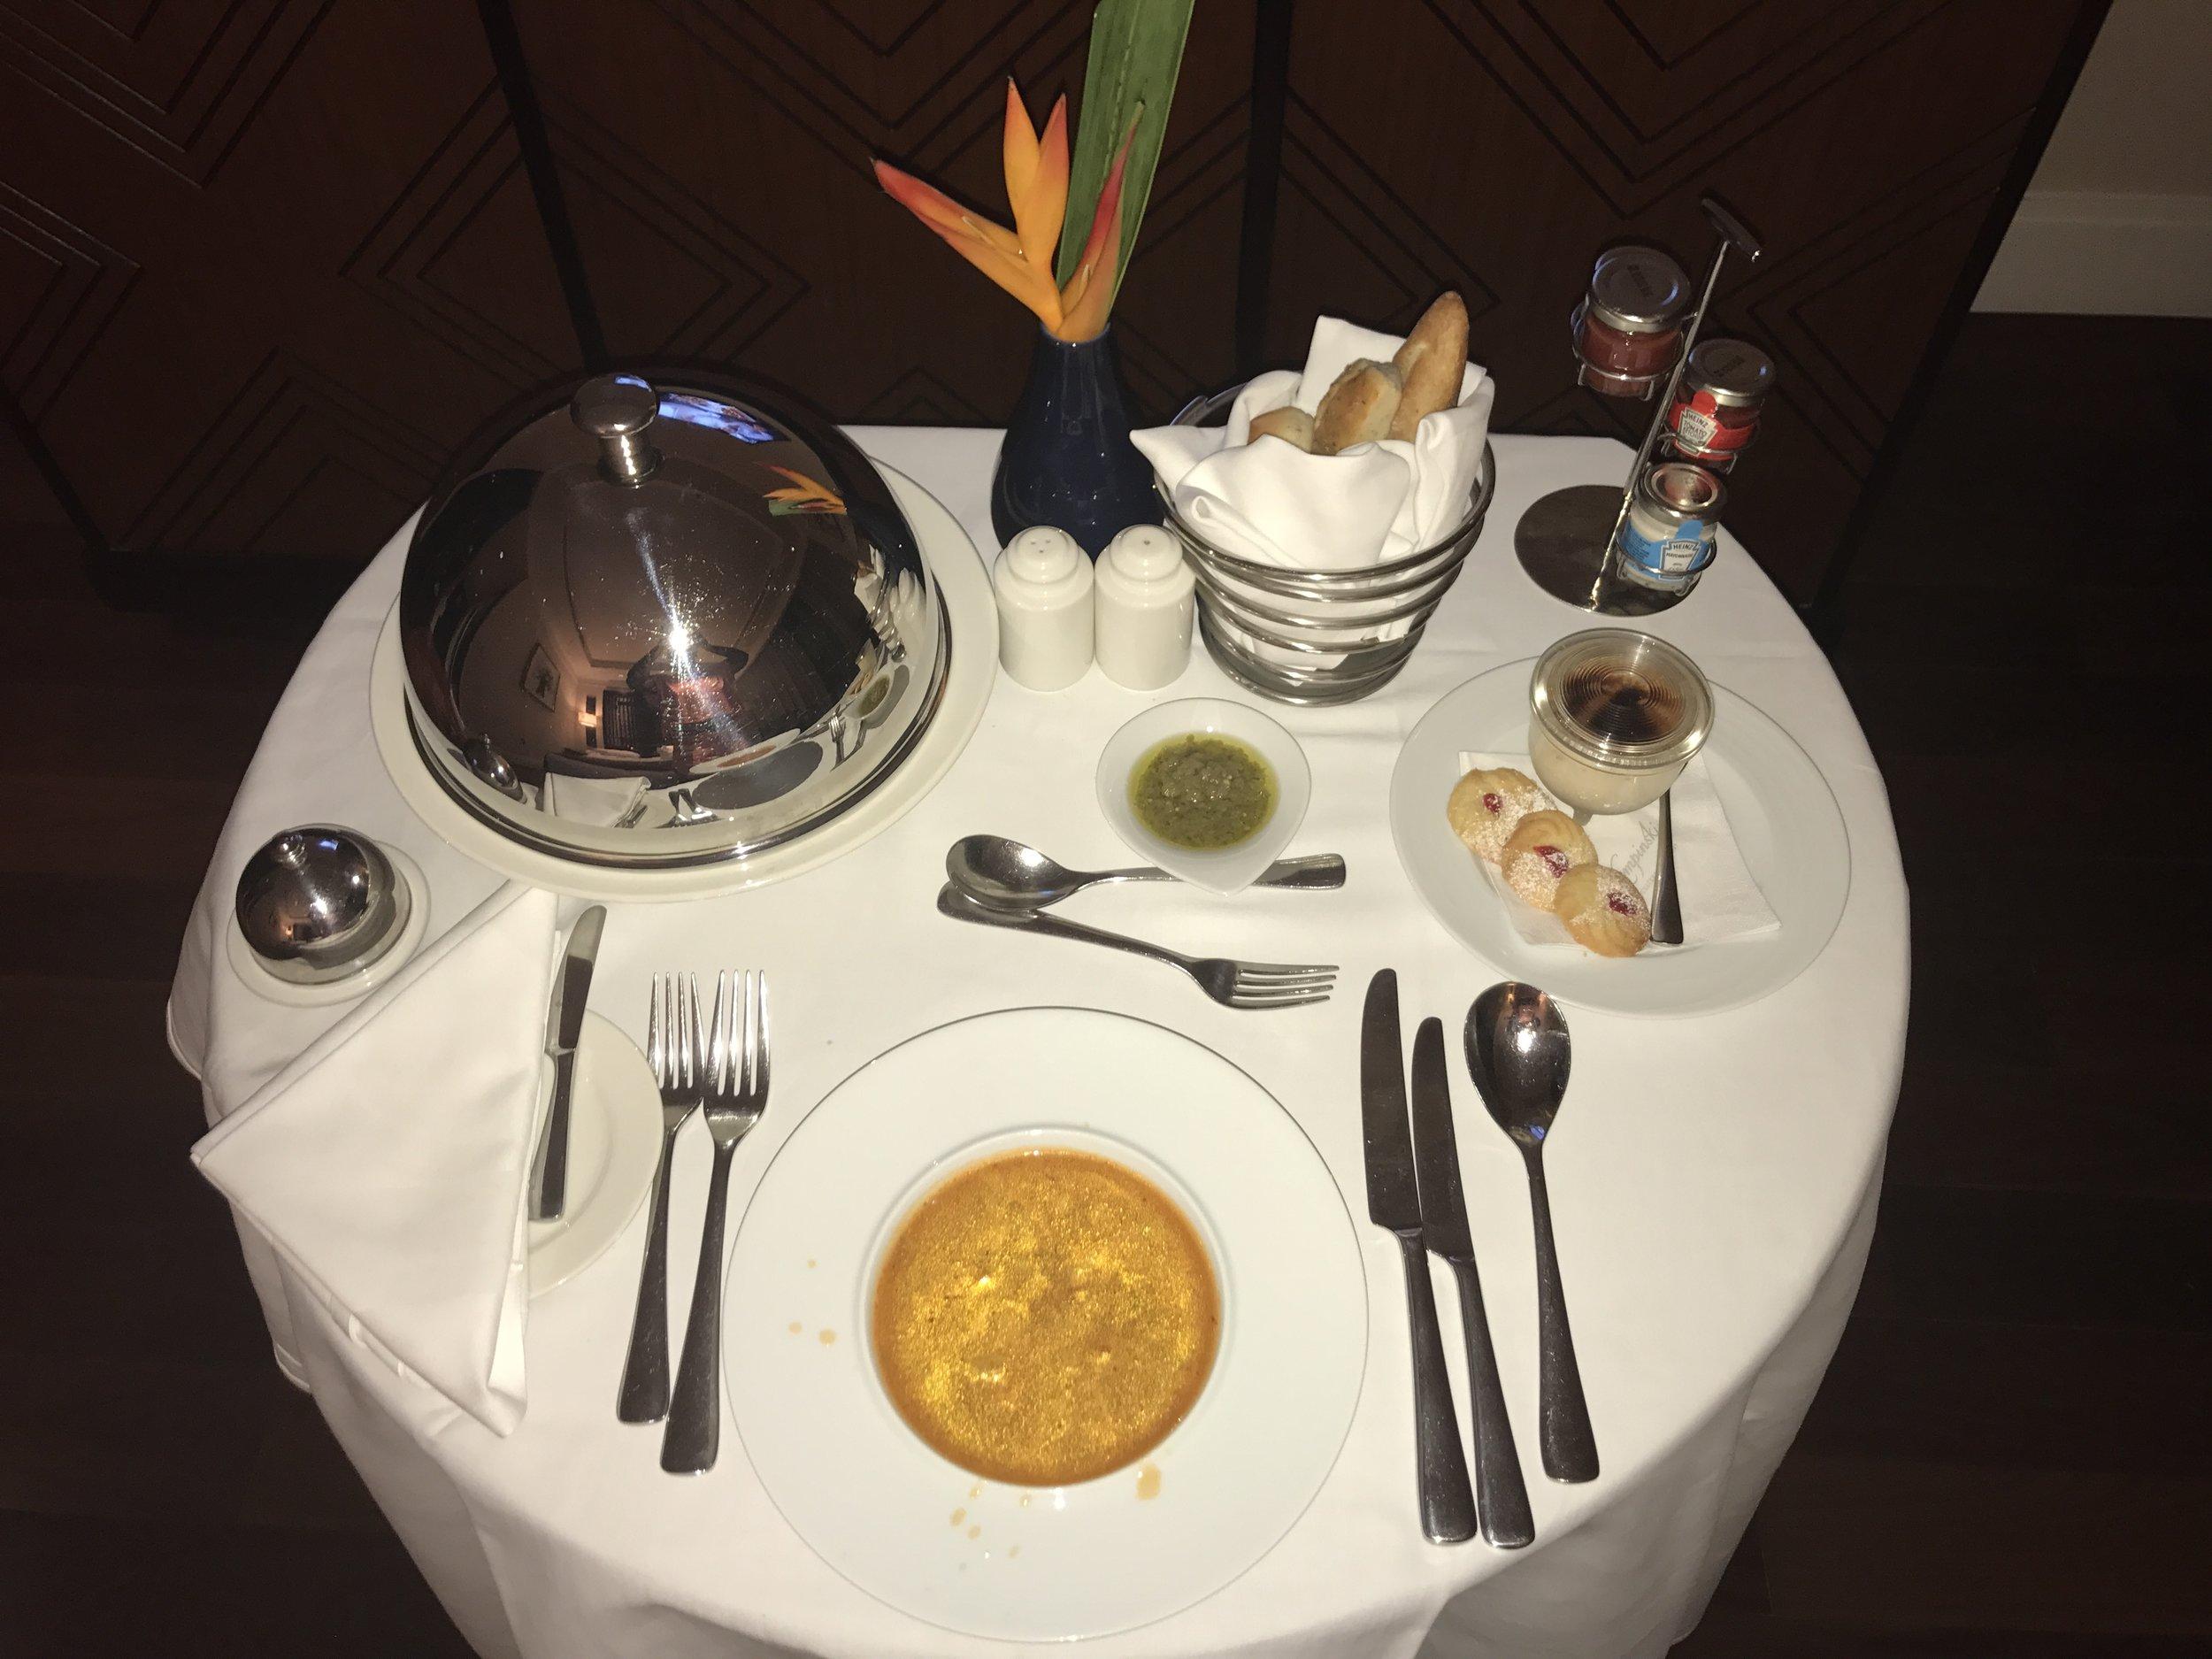 Kempinski-Goldcoast-Accra-Hotel-Review-Photos-vickieremoeofficial20.JPG